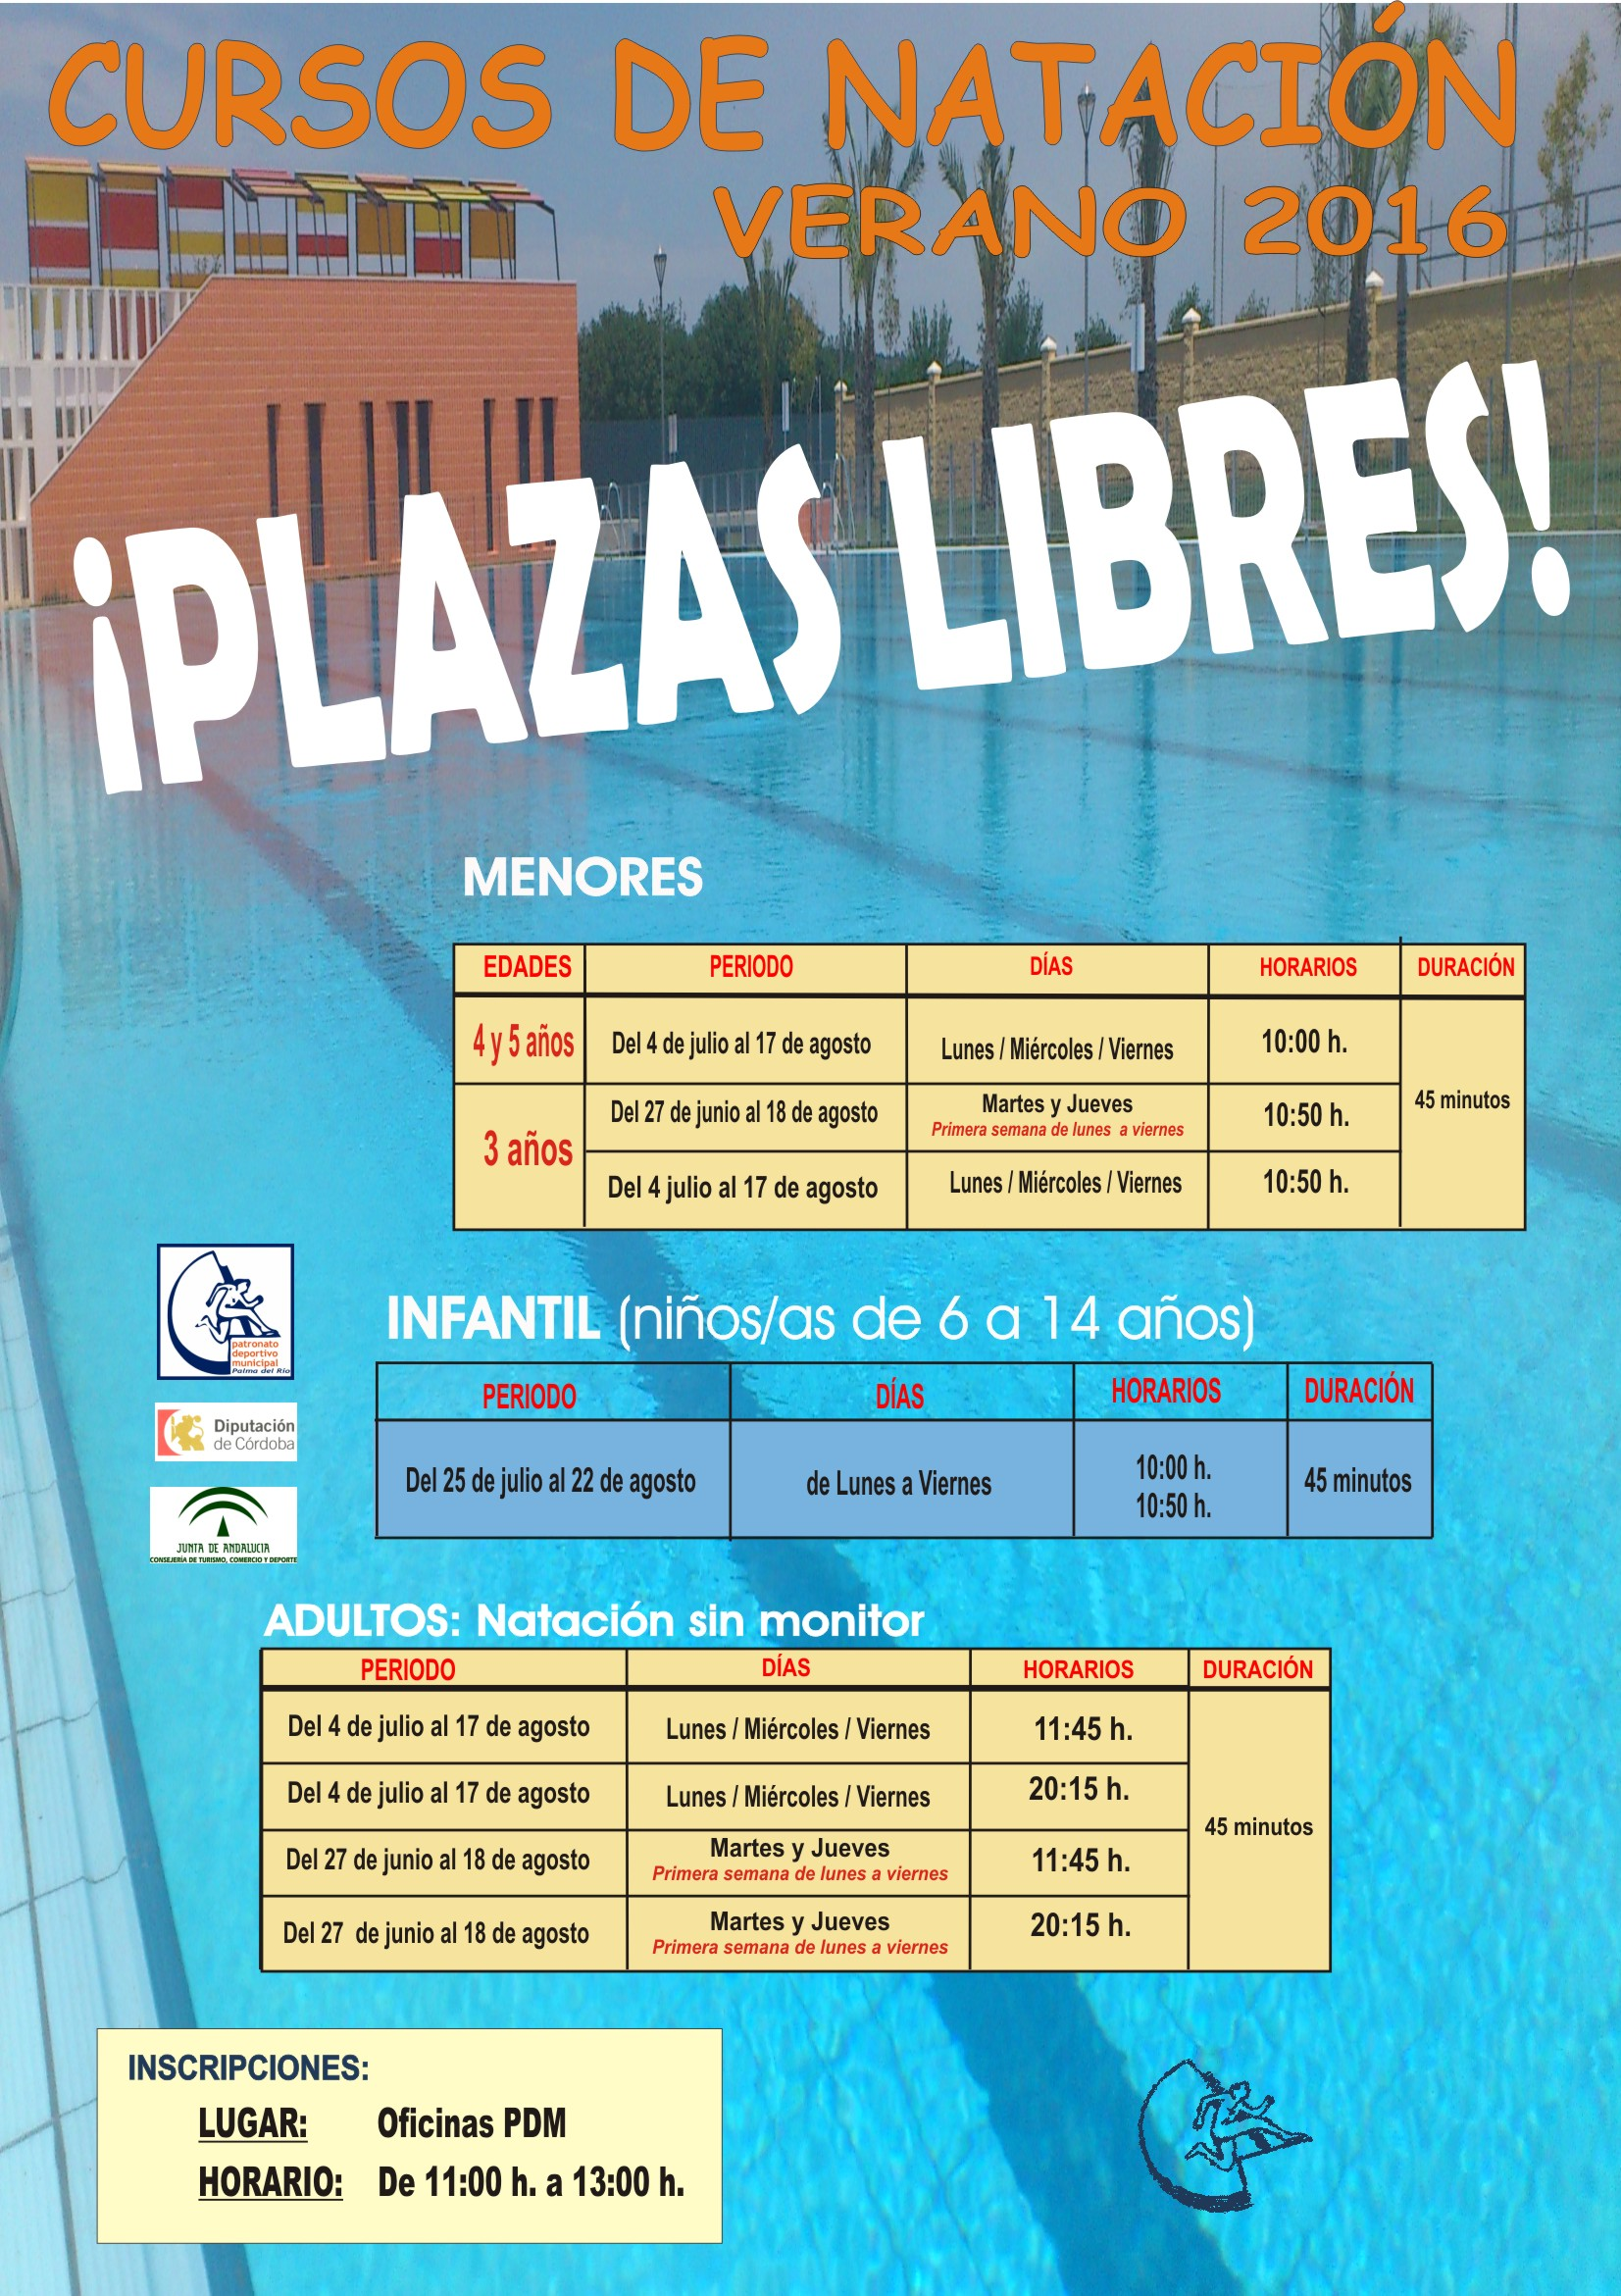 https://www.palmadelrio.es/sites/default/files/natacionverano2016plazaslibres.jpg